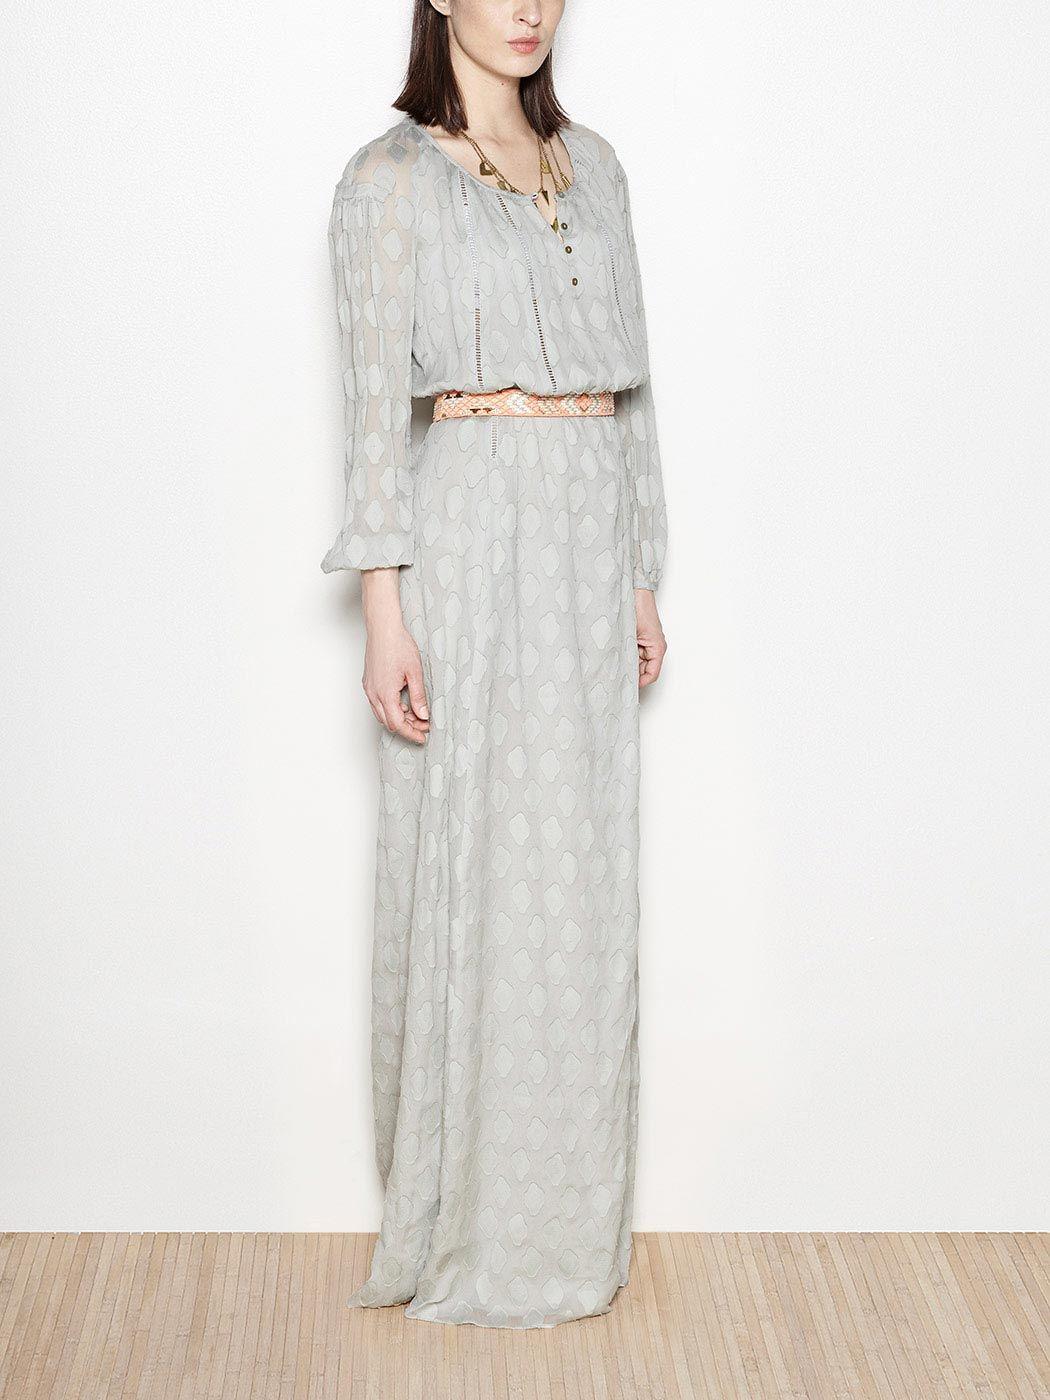 Hemstitches silk maxi dress | Hoss Intropia Portugal